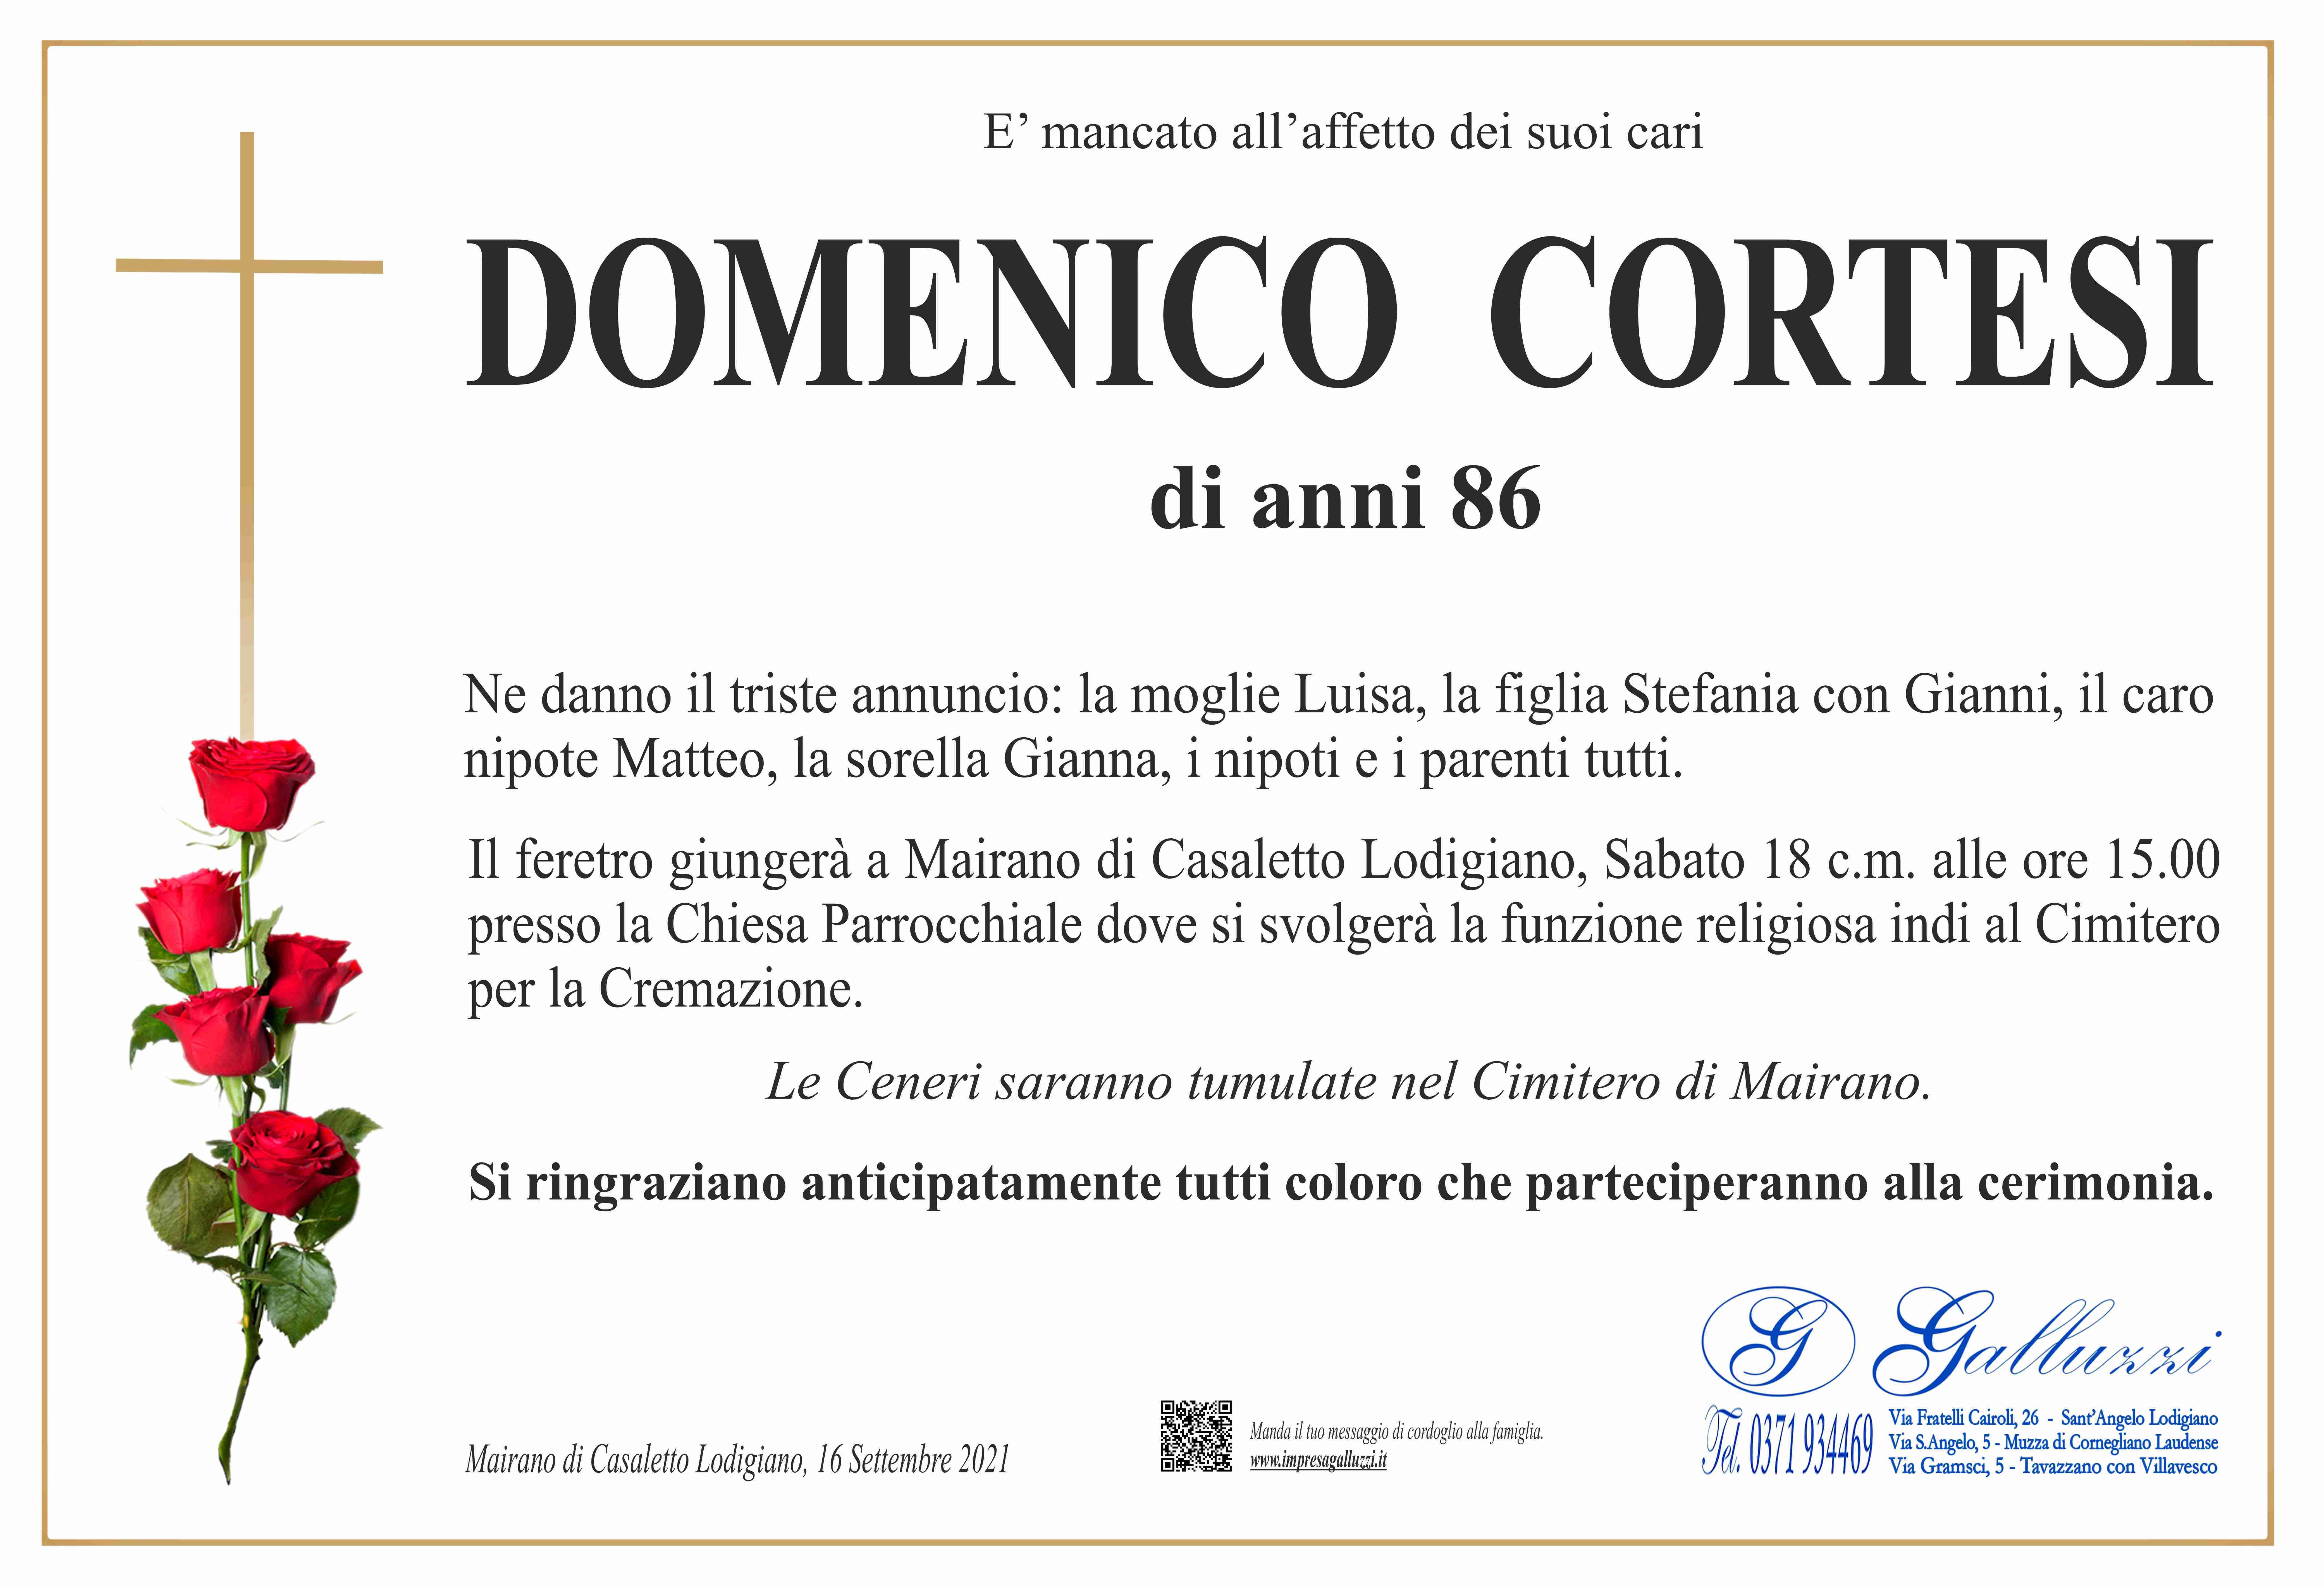 Domenico Cortesi